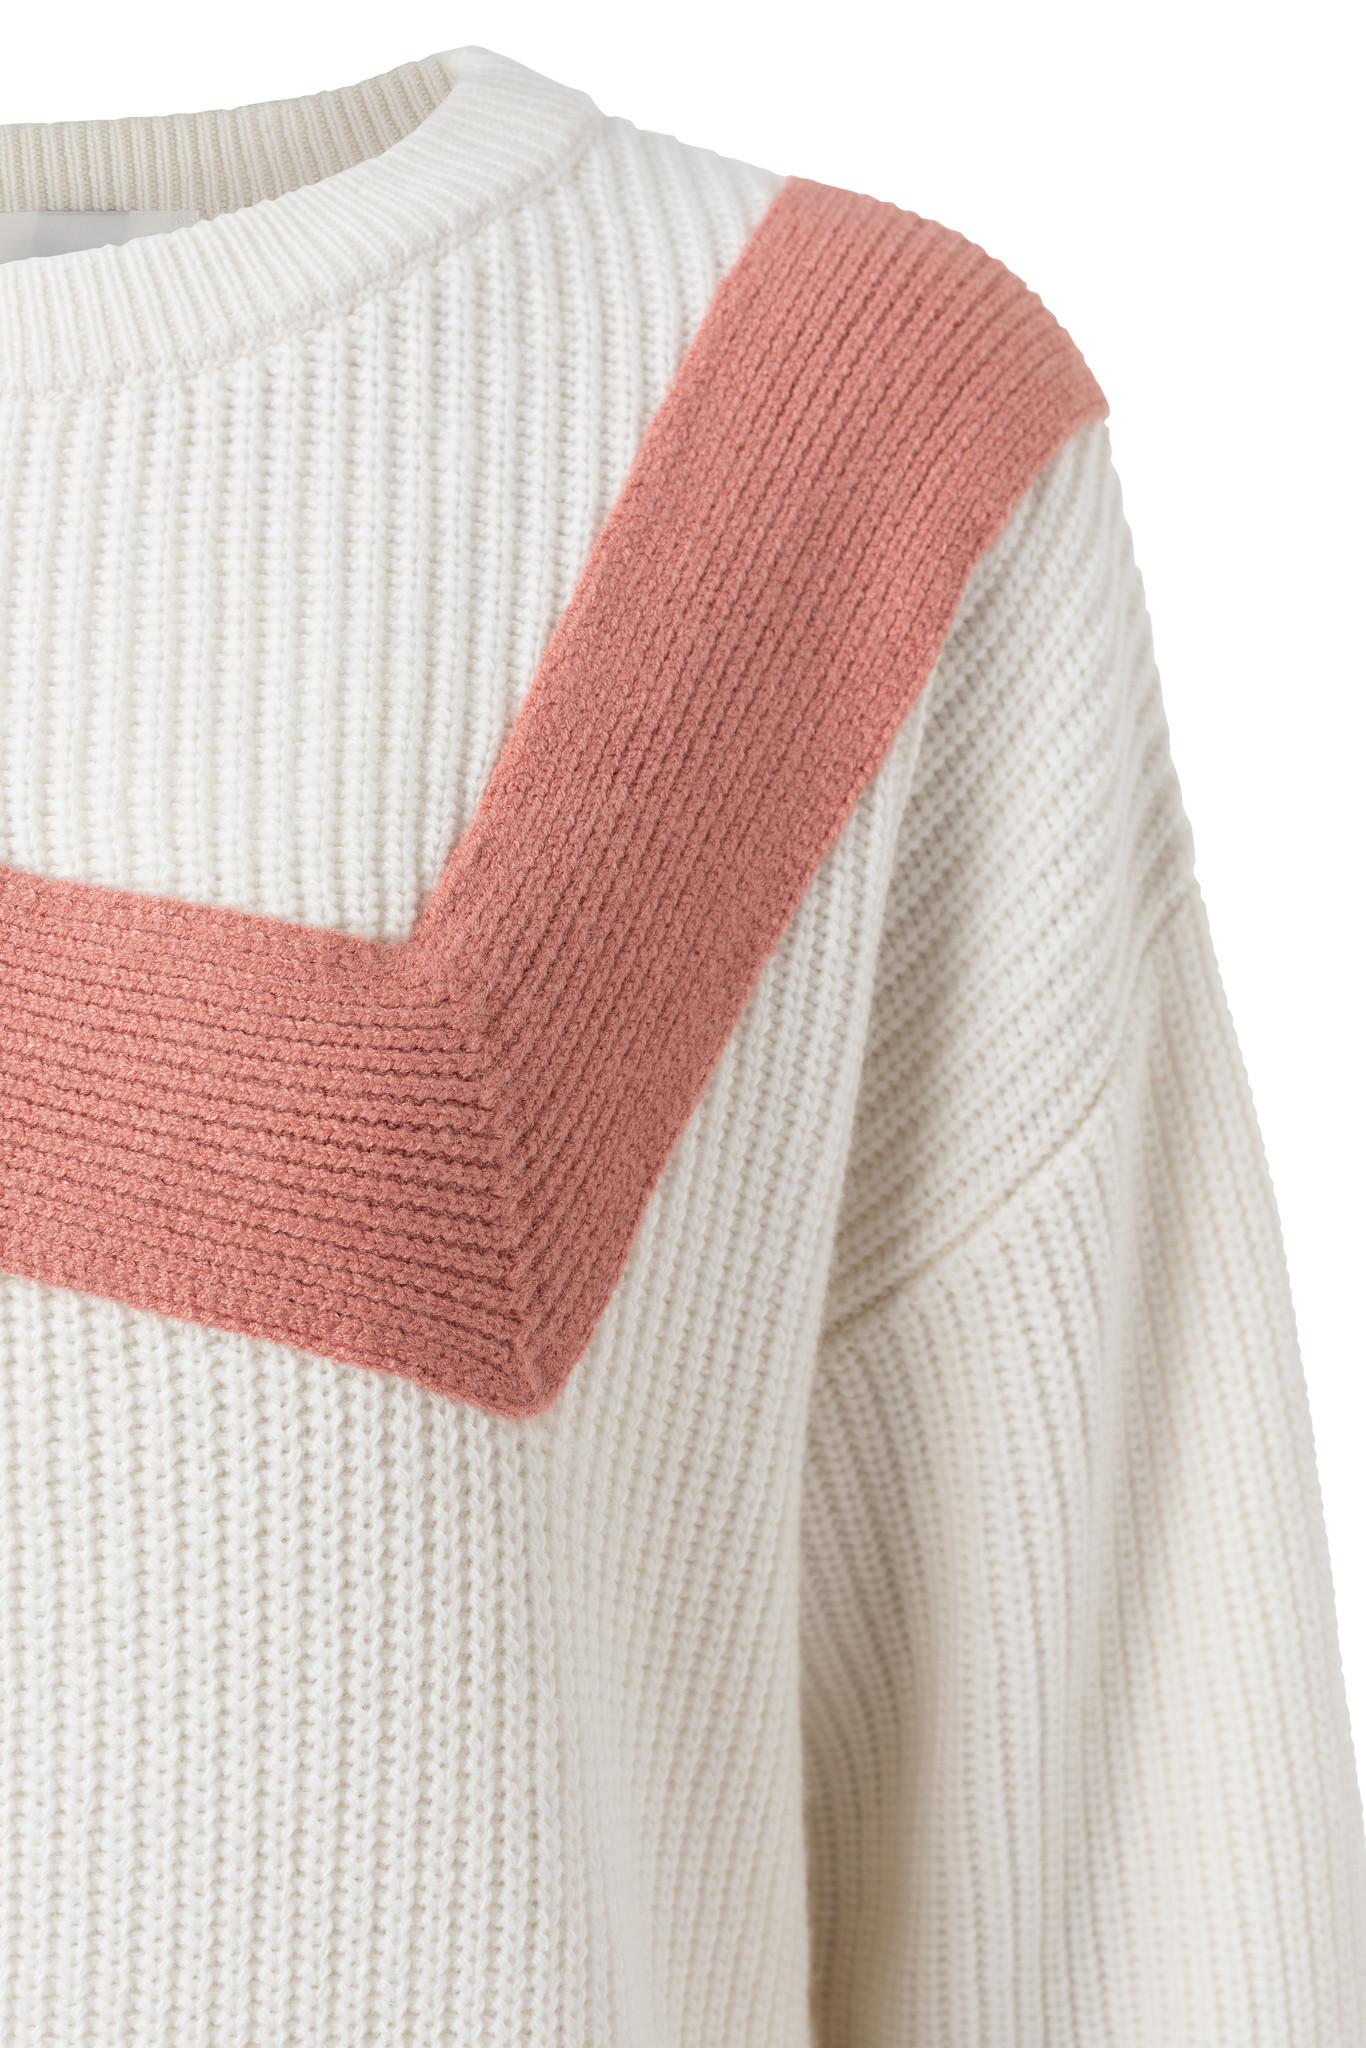 yaya Zig zag sweater 1000389-111-2